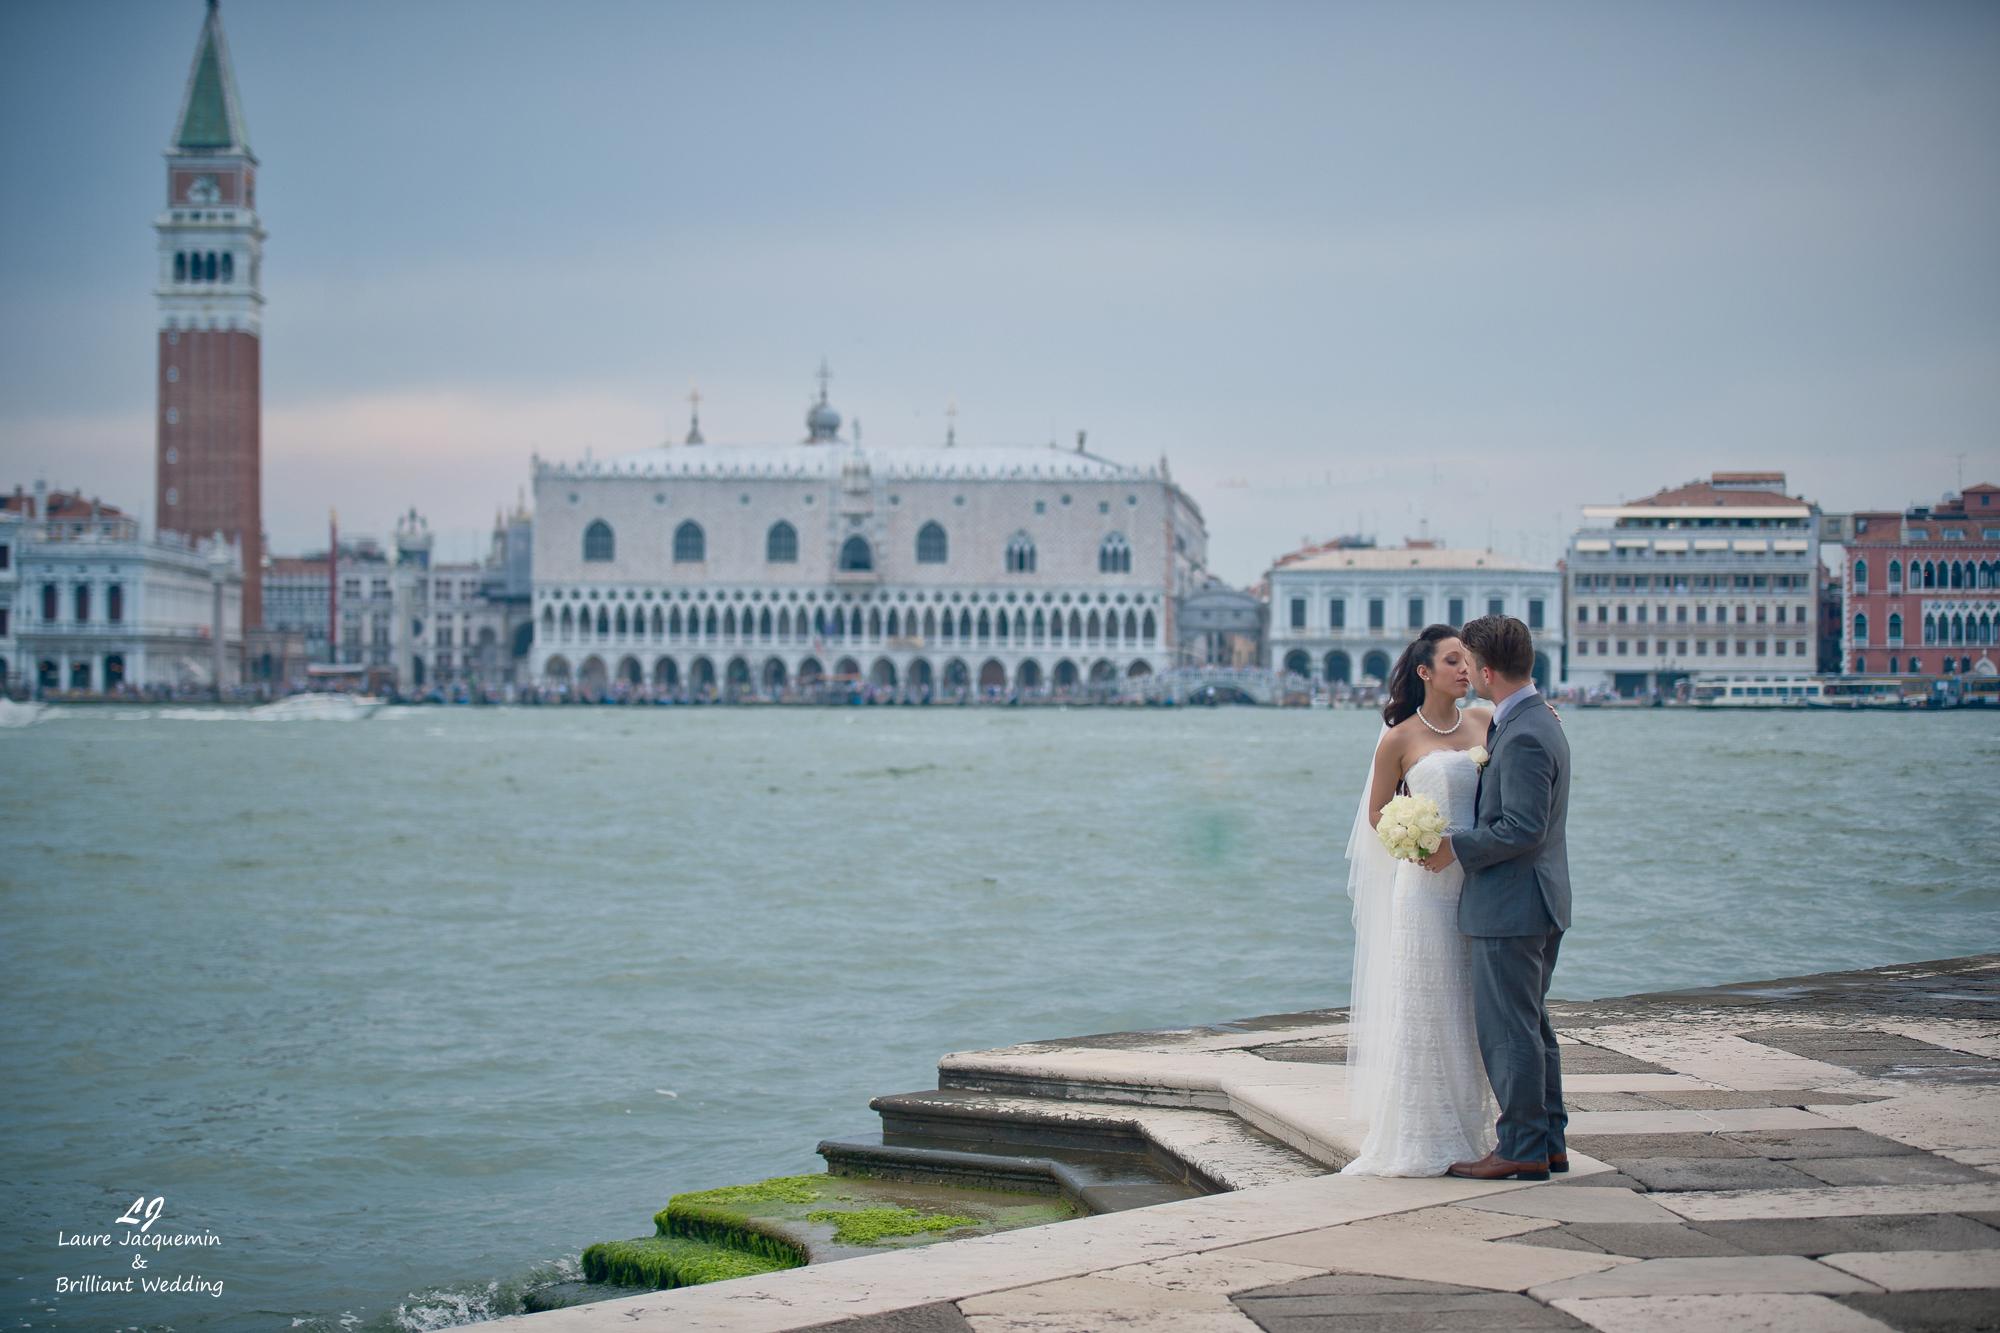 Venice Simbolic Wedding gondola venice Italy laure jacquemin photography (74) copia